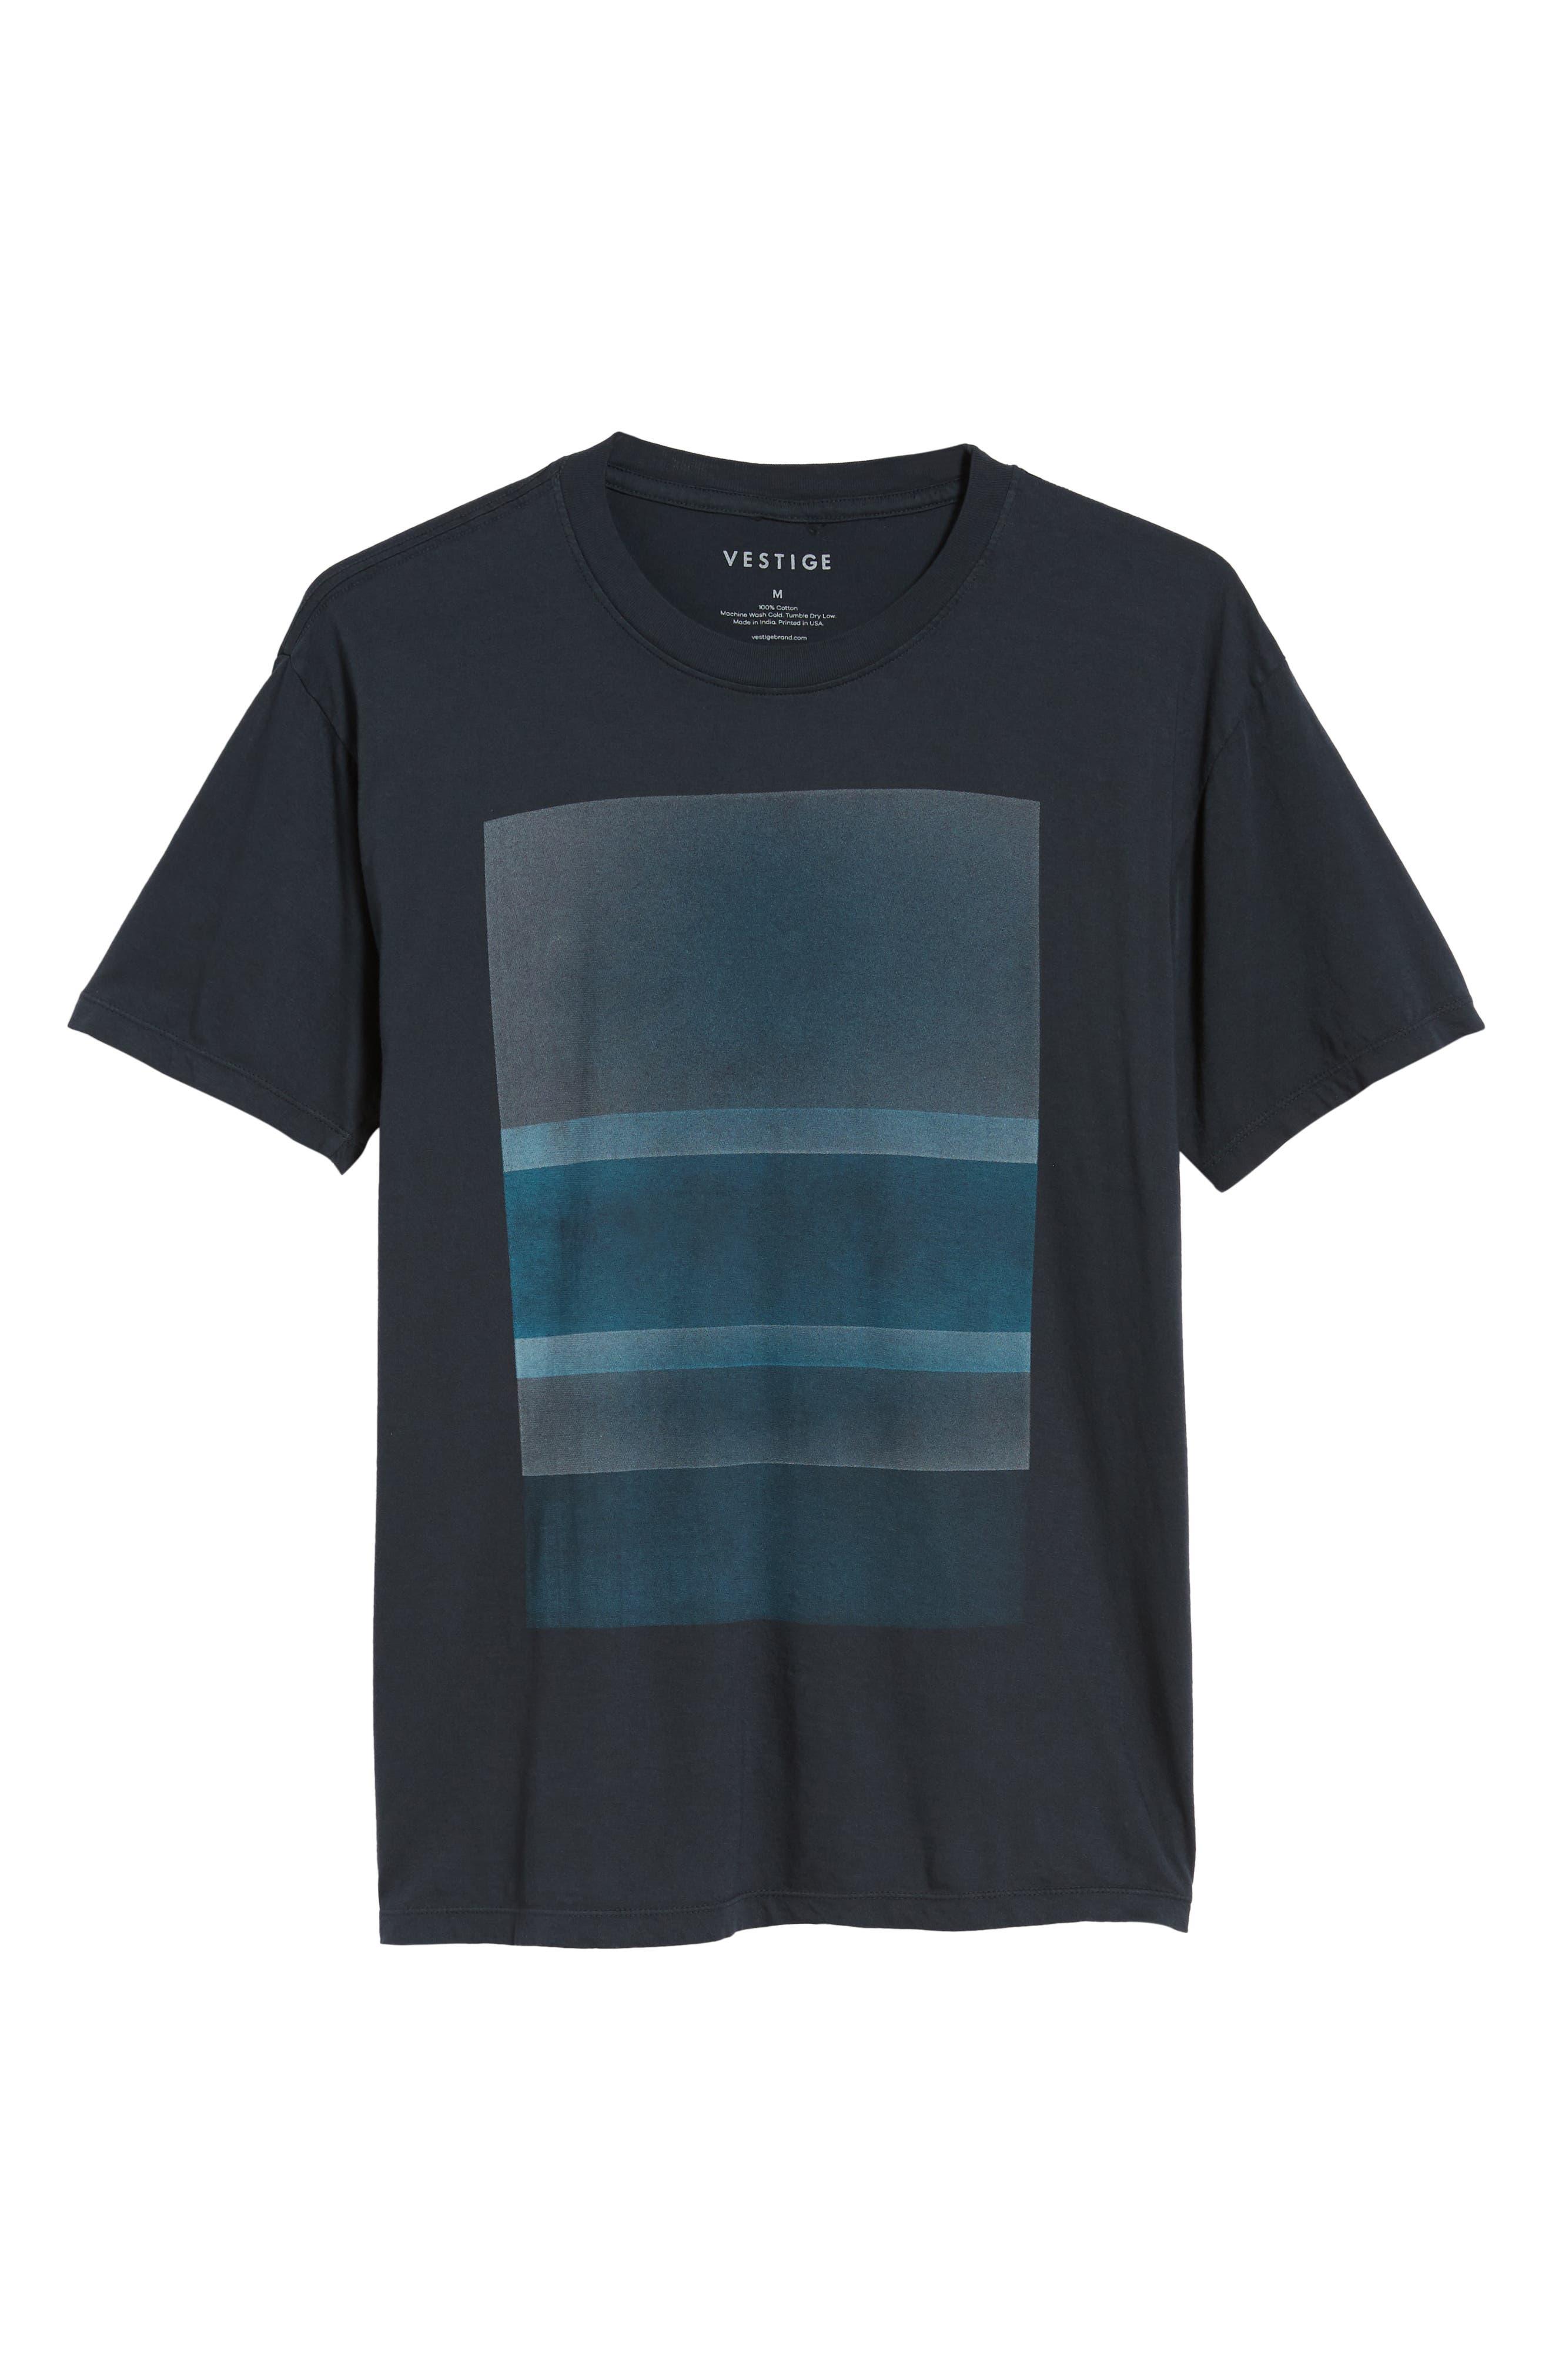 Motion Graphic T-Shirt,                             Alternate thumbnail 6, color,                             BLACK